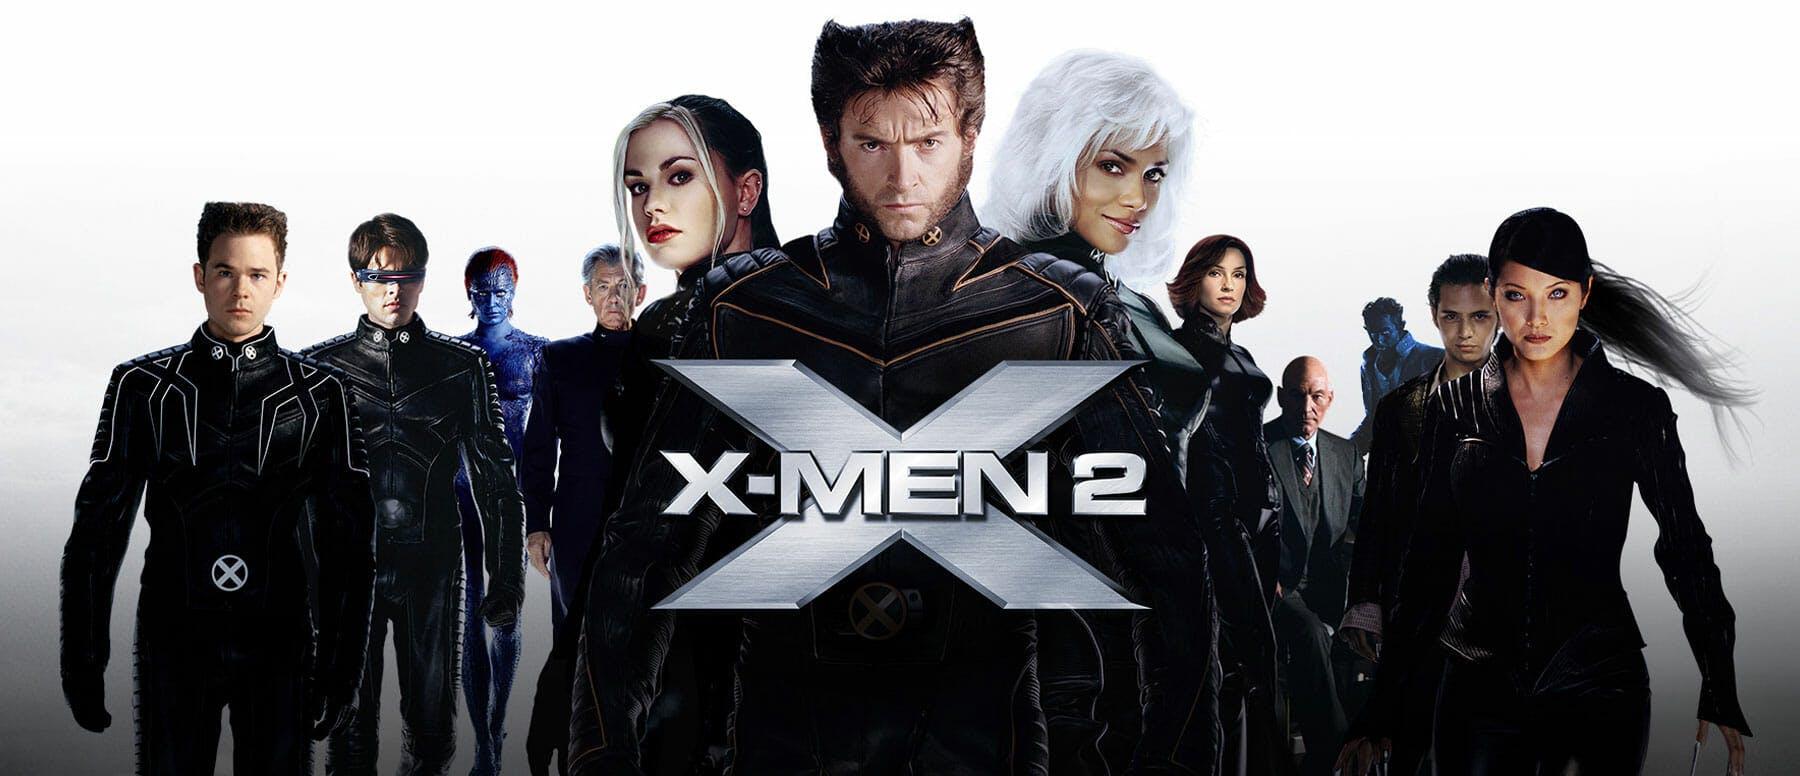 best x-men movies ranked